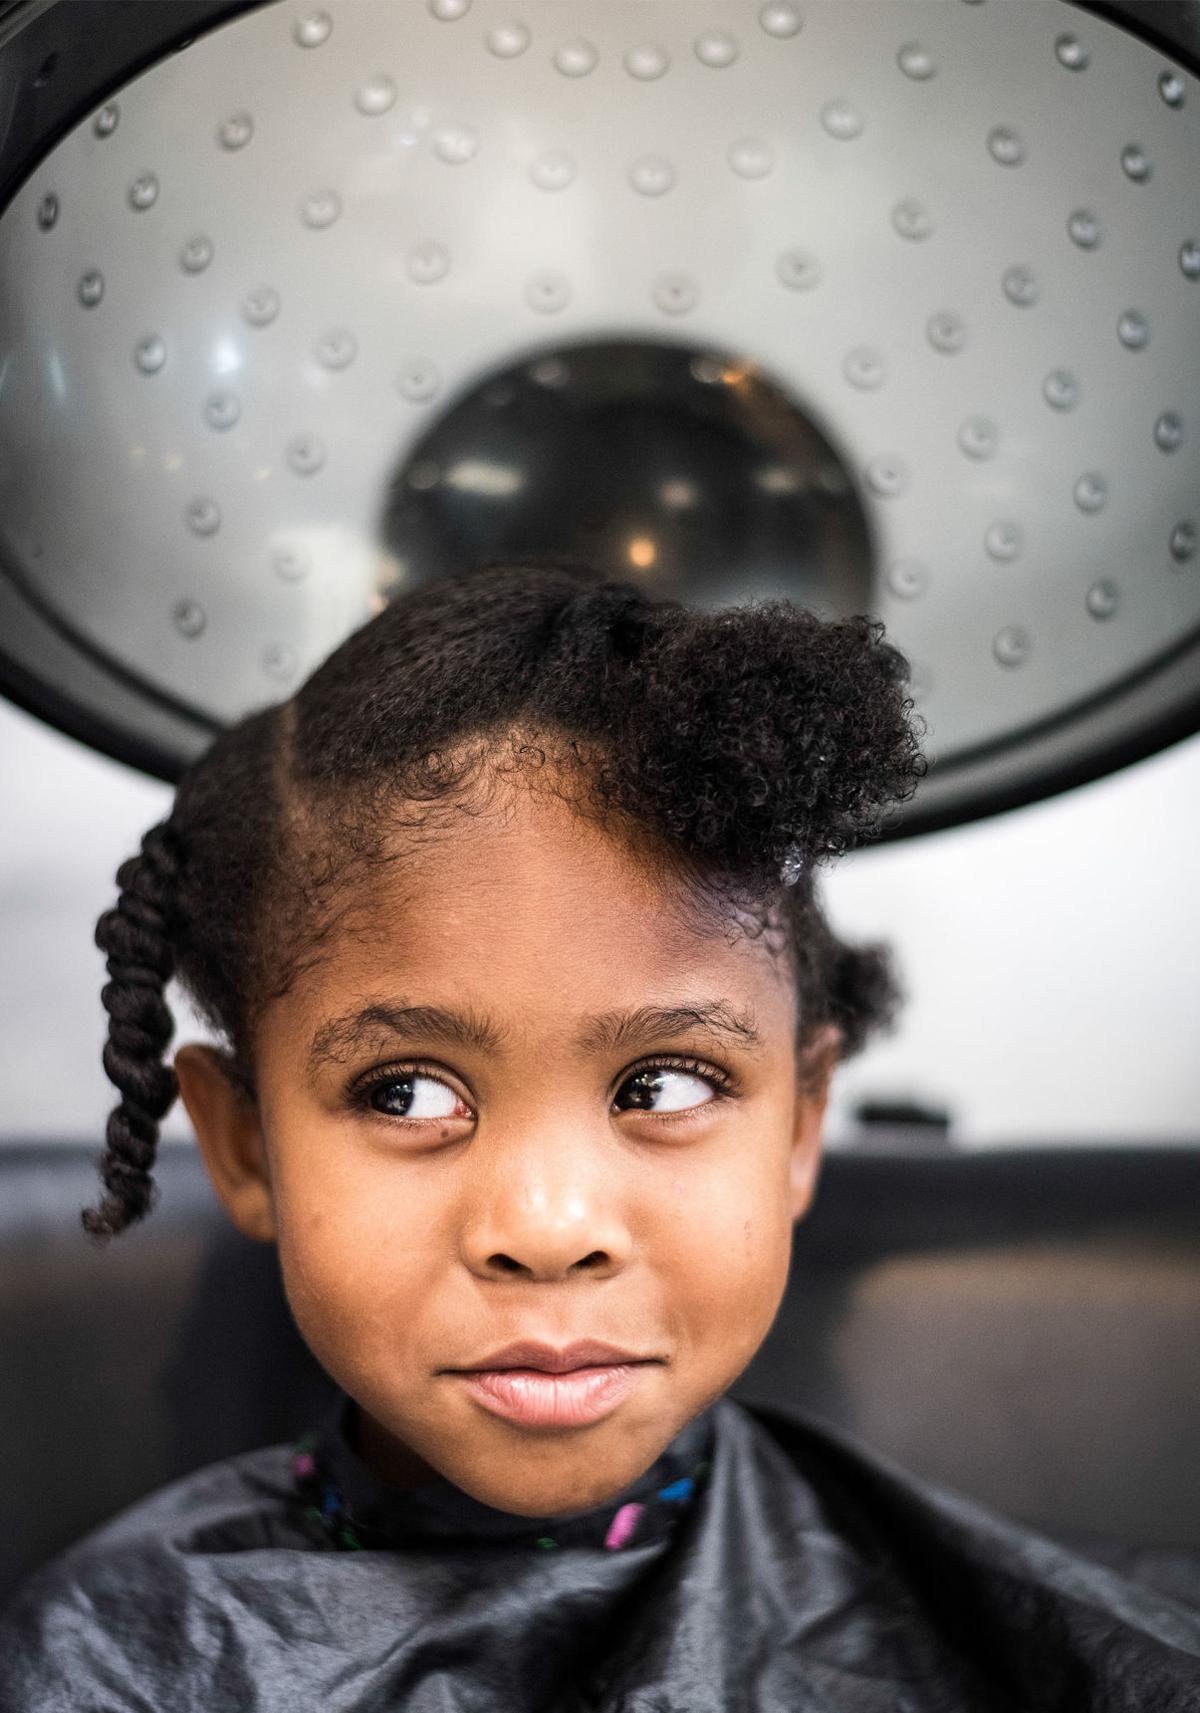 Corey Pauls Hair Studio Gives Free Haircuts To Students Galleries